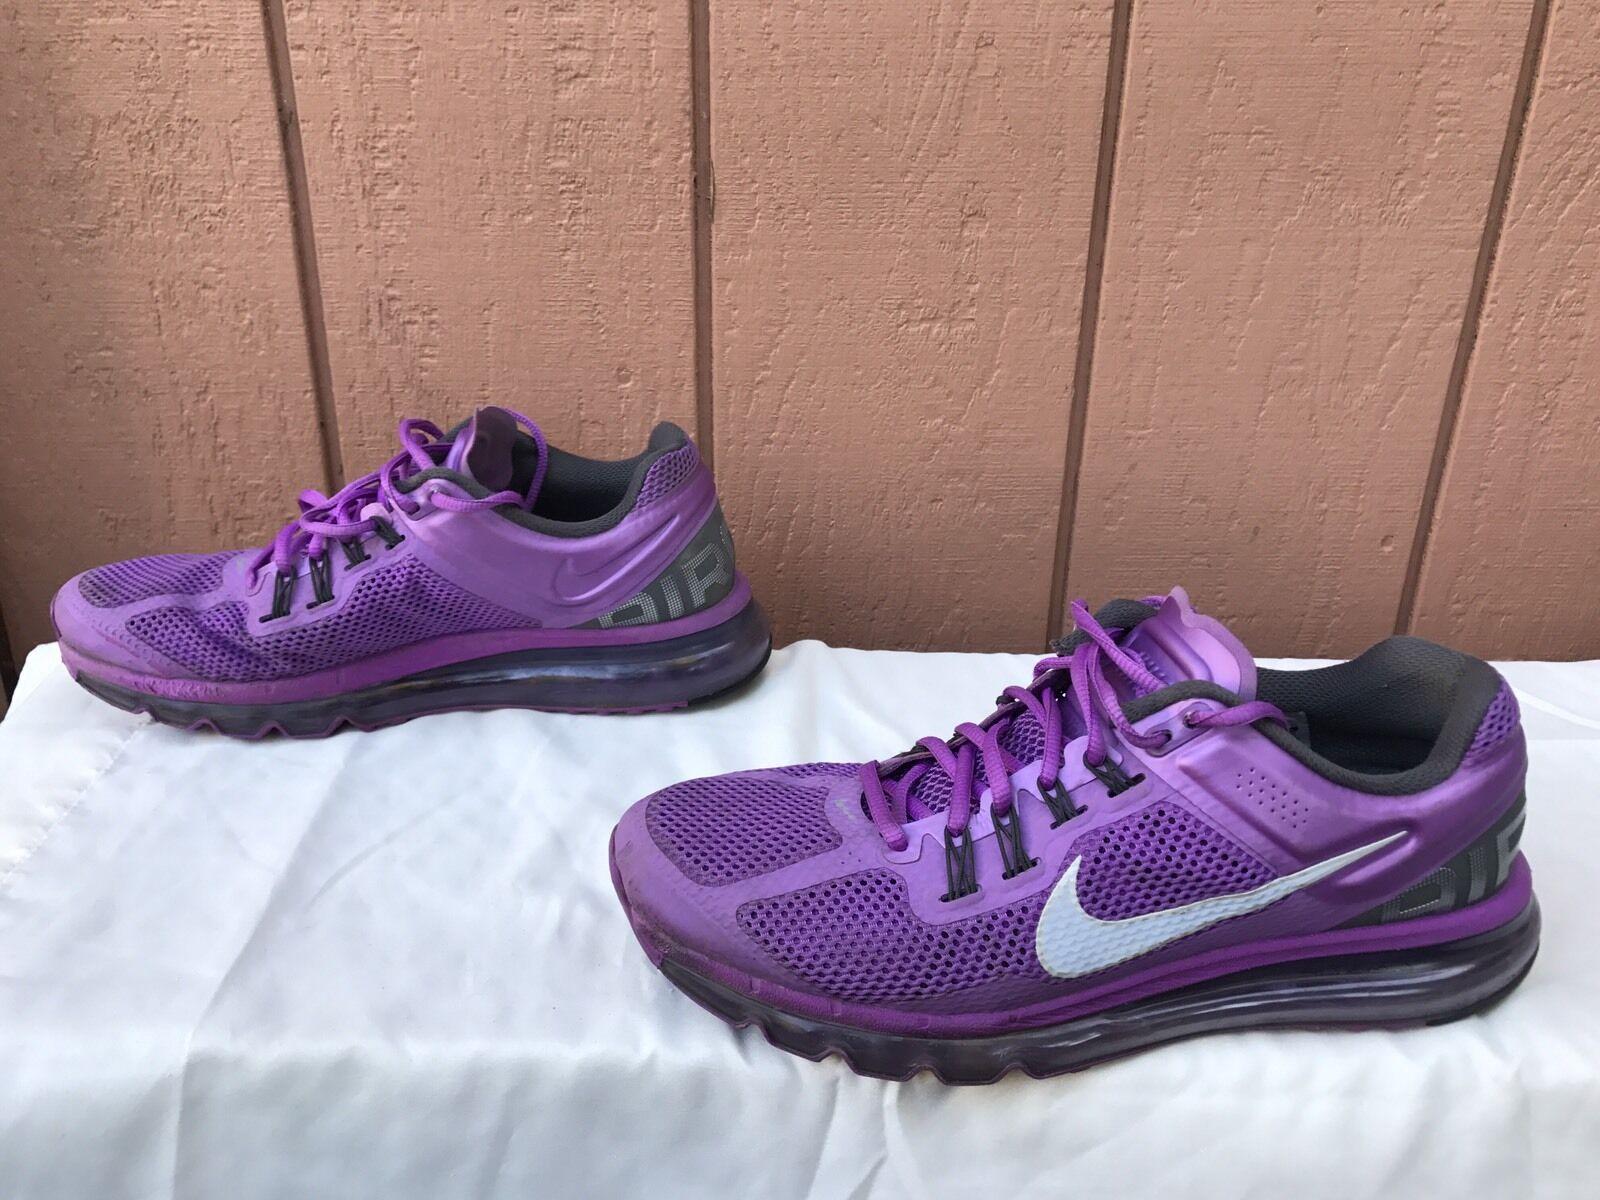 EUC EUC EUC NIKE AIR MAX+ LASER PURPLE Women's Running shoes US 11 2067ab